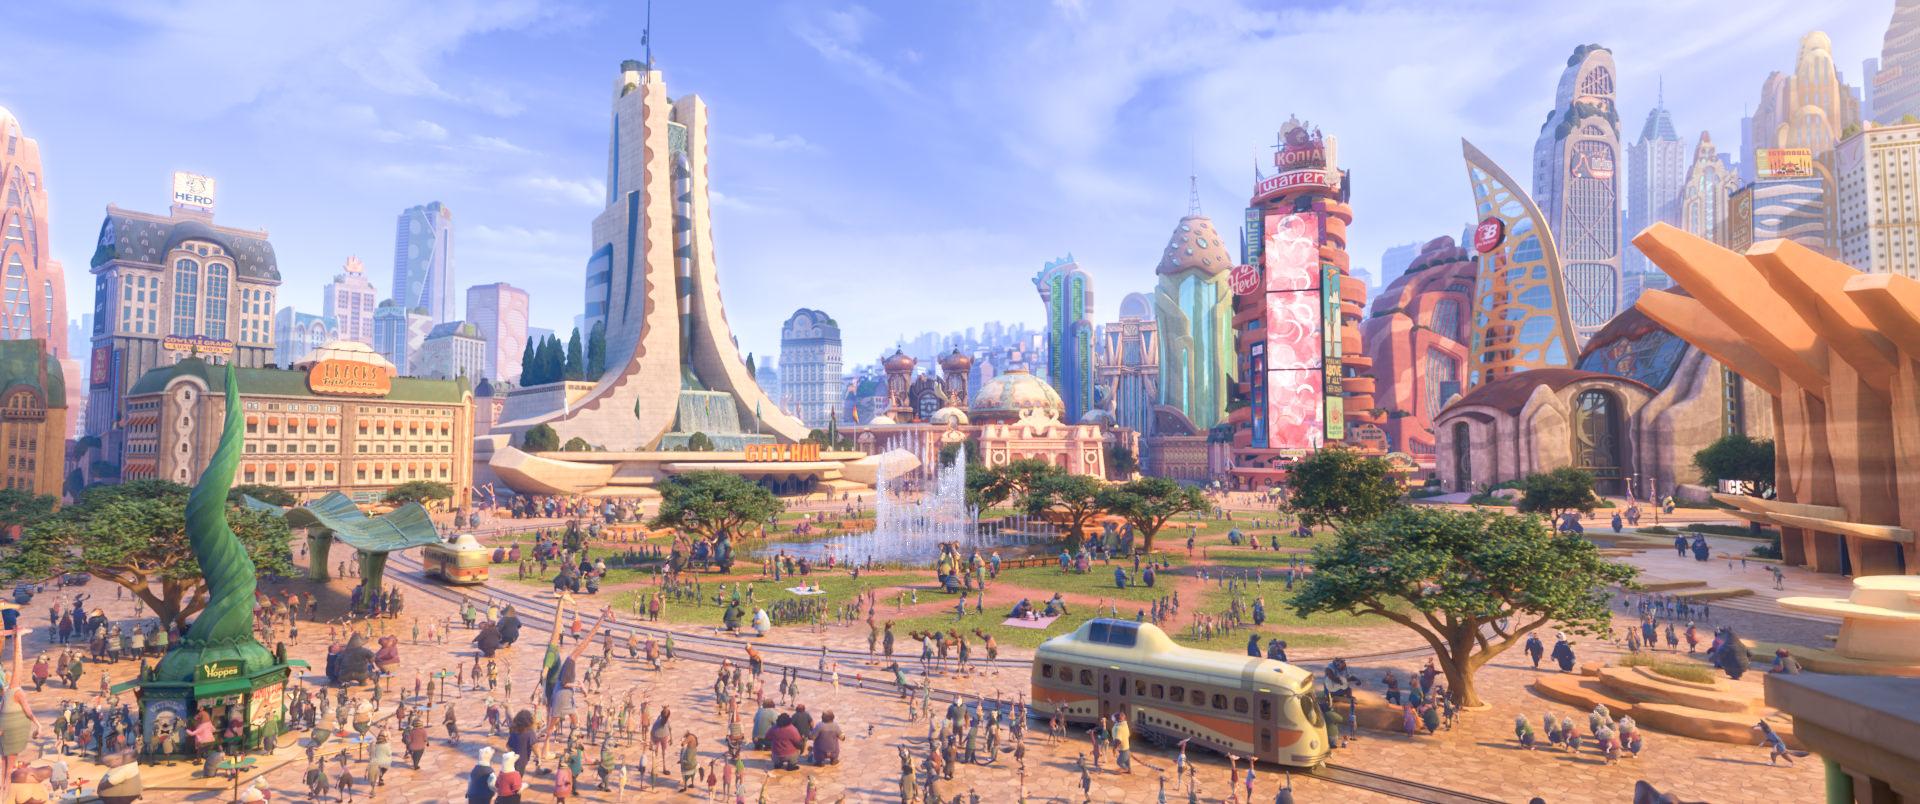 EXKLUSIV BEI FILM.TV: Neue Bilder aus Disneys ZOOMANIA